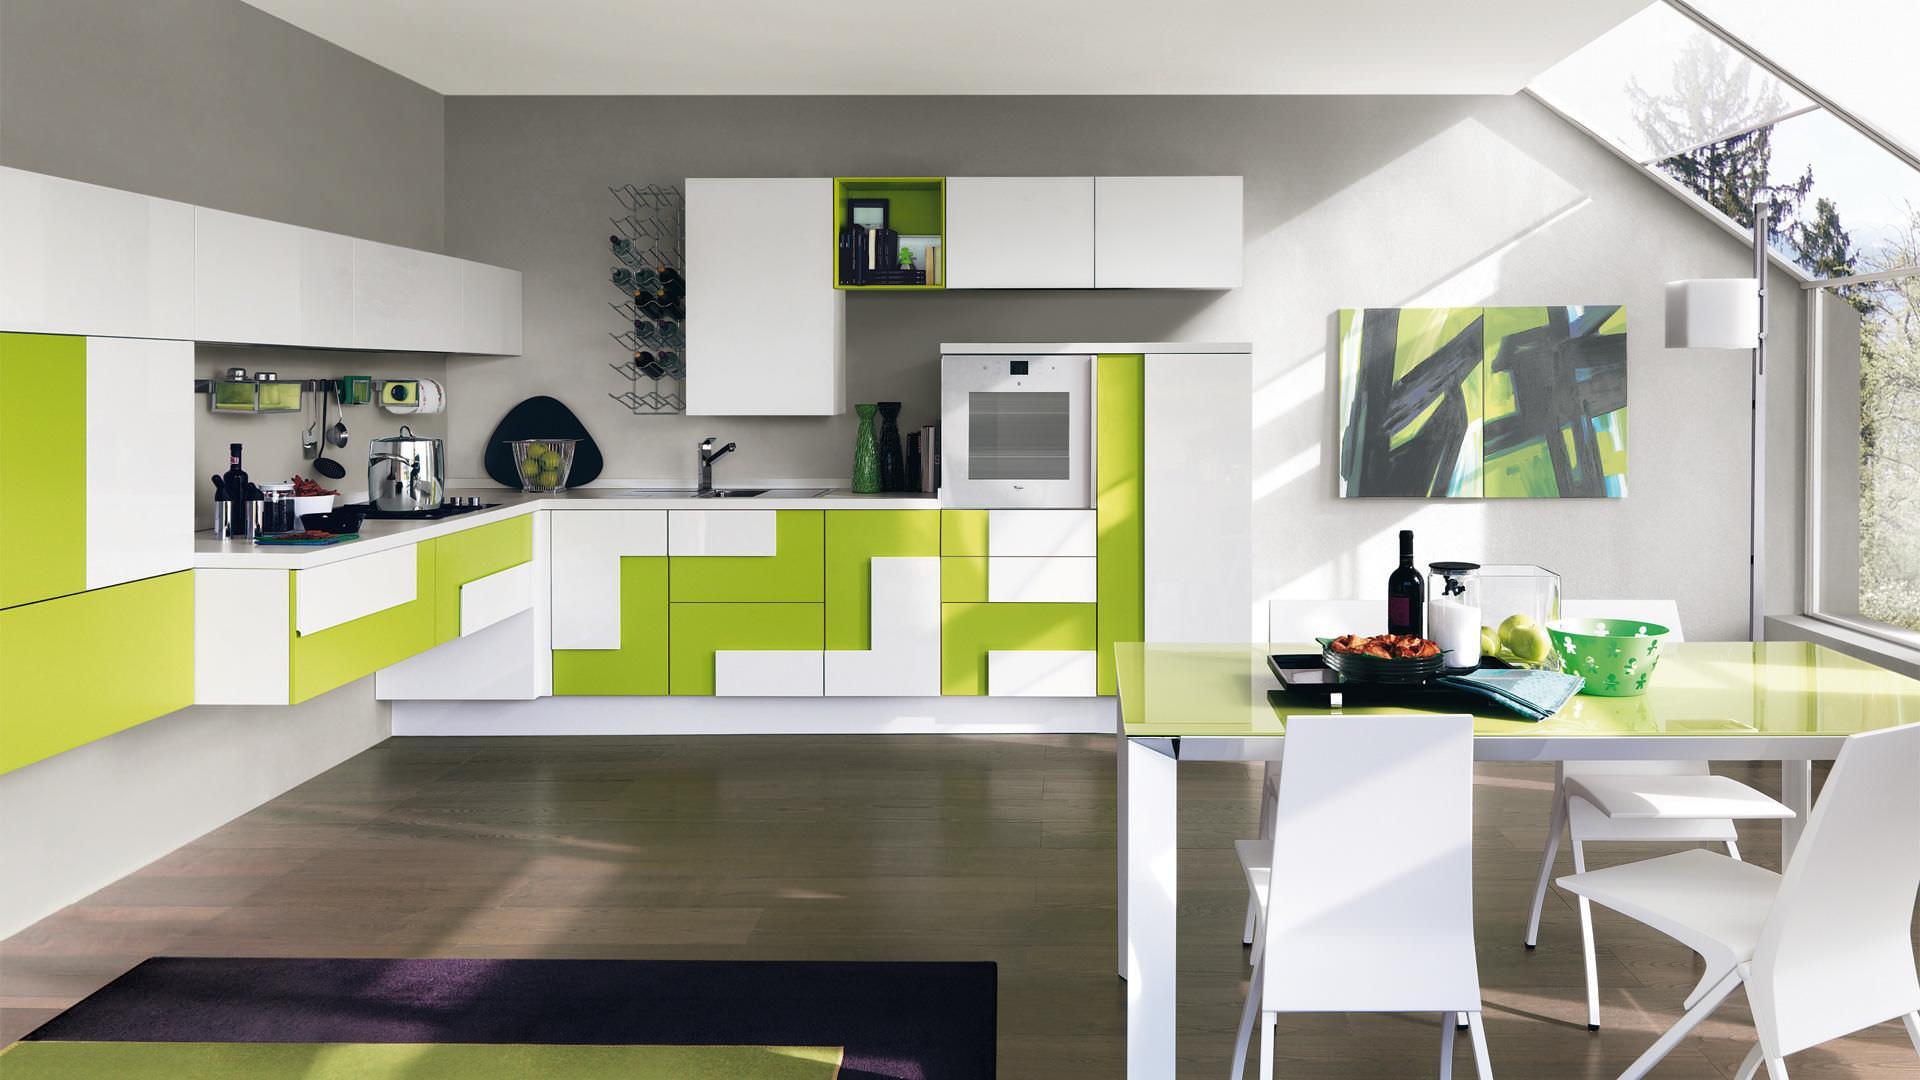 Cucina moderna / in legno / laccata / senza maniglie - CREATIVA ...